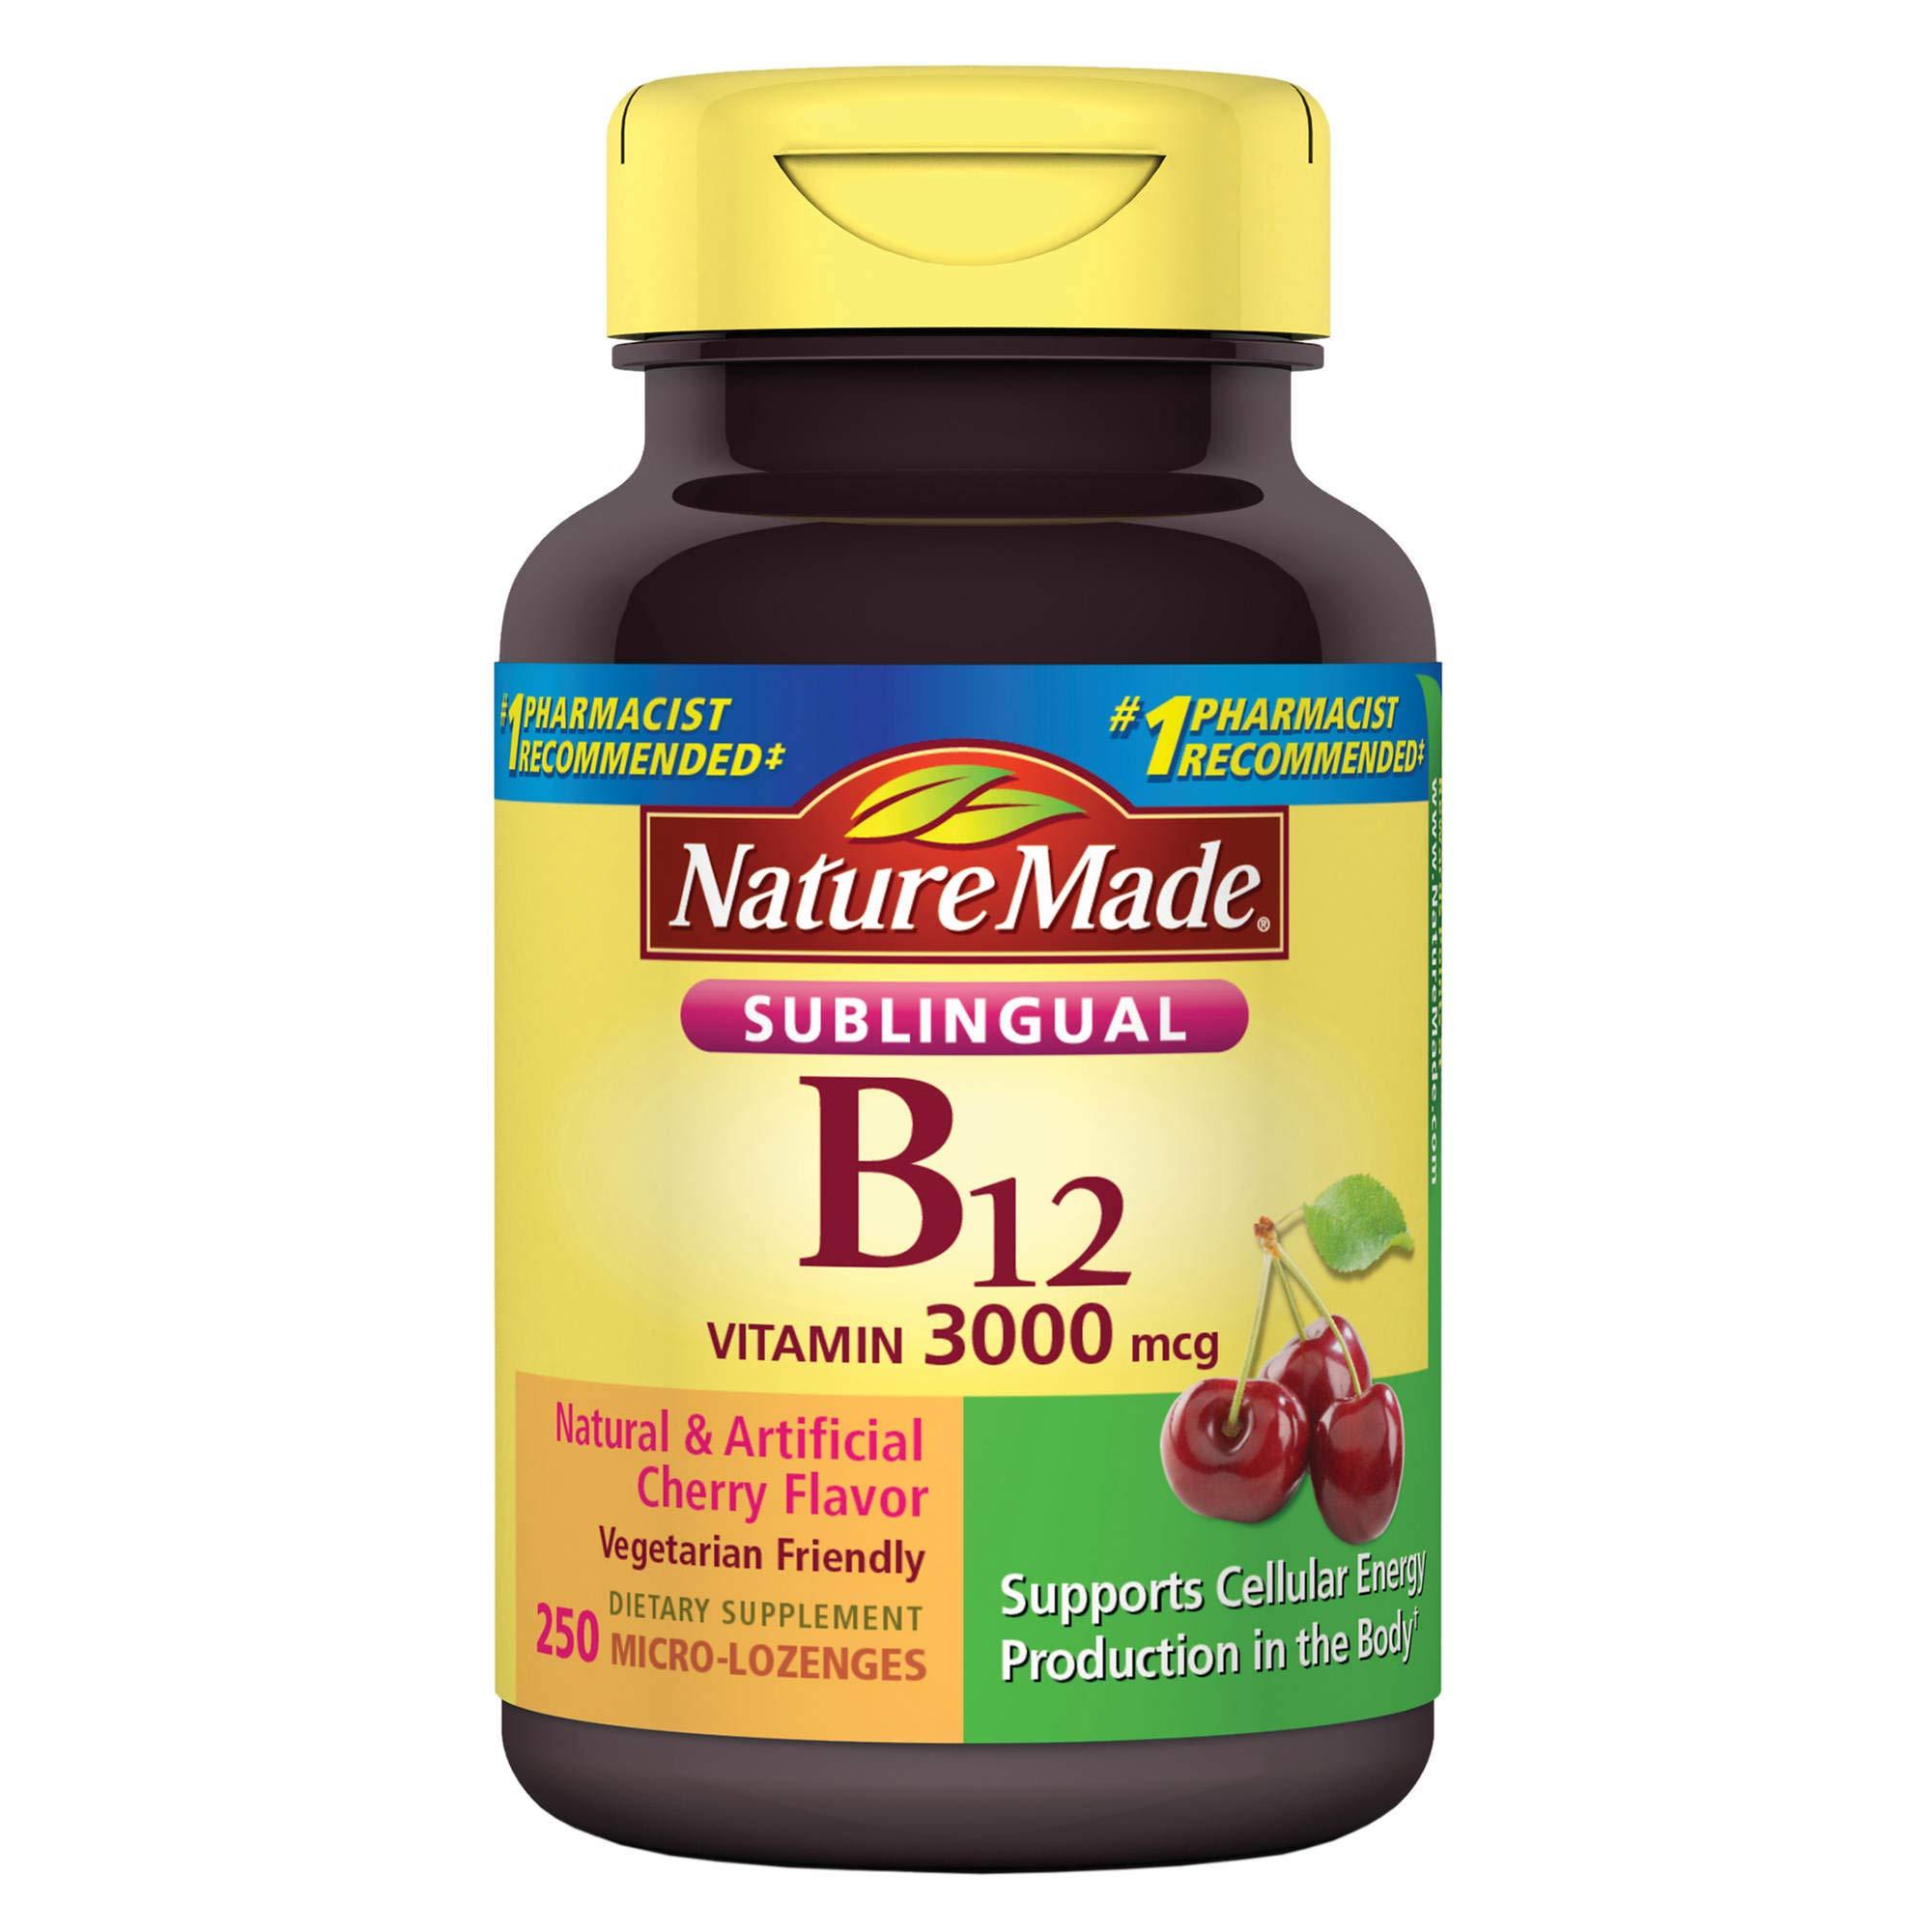 Nature Made Vitamin B-12 3000mcg, Sublingual Lozenges, Cherry (500ct)